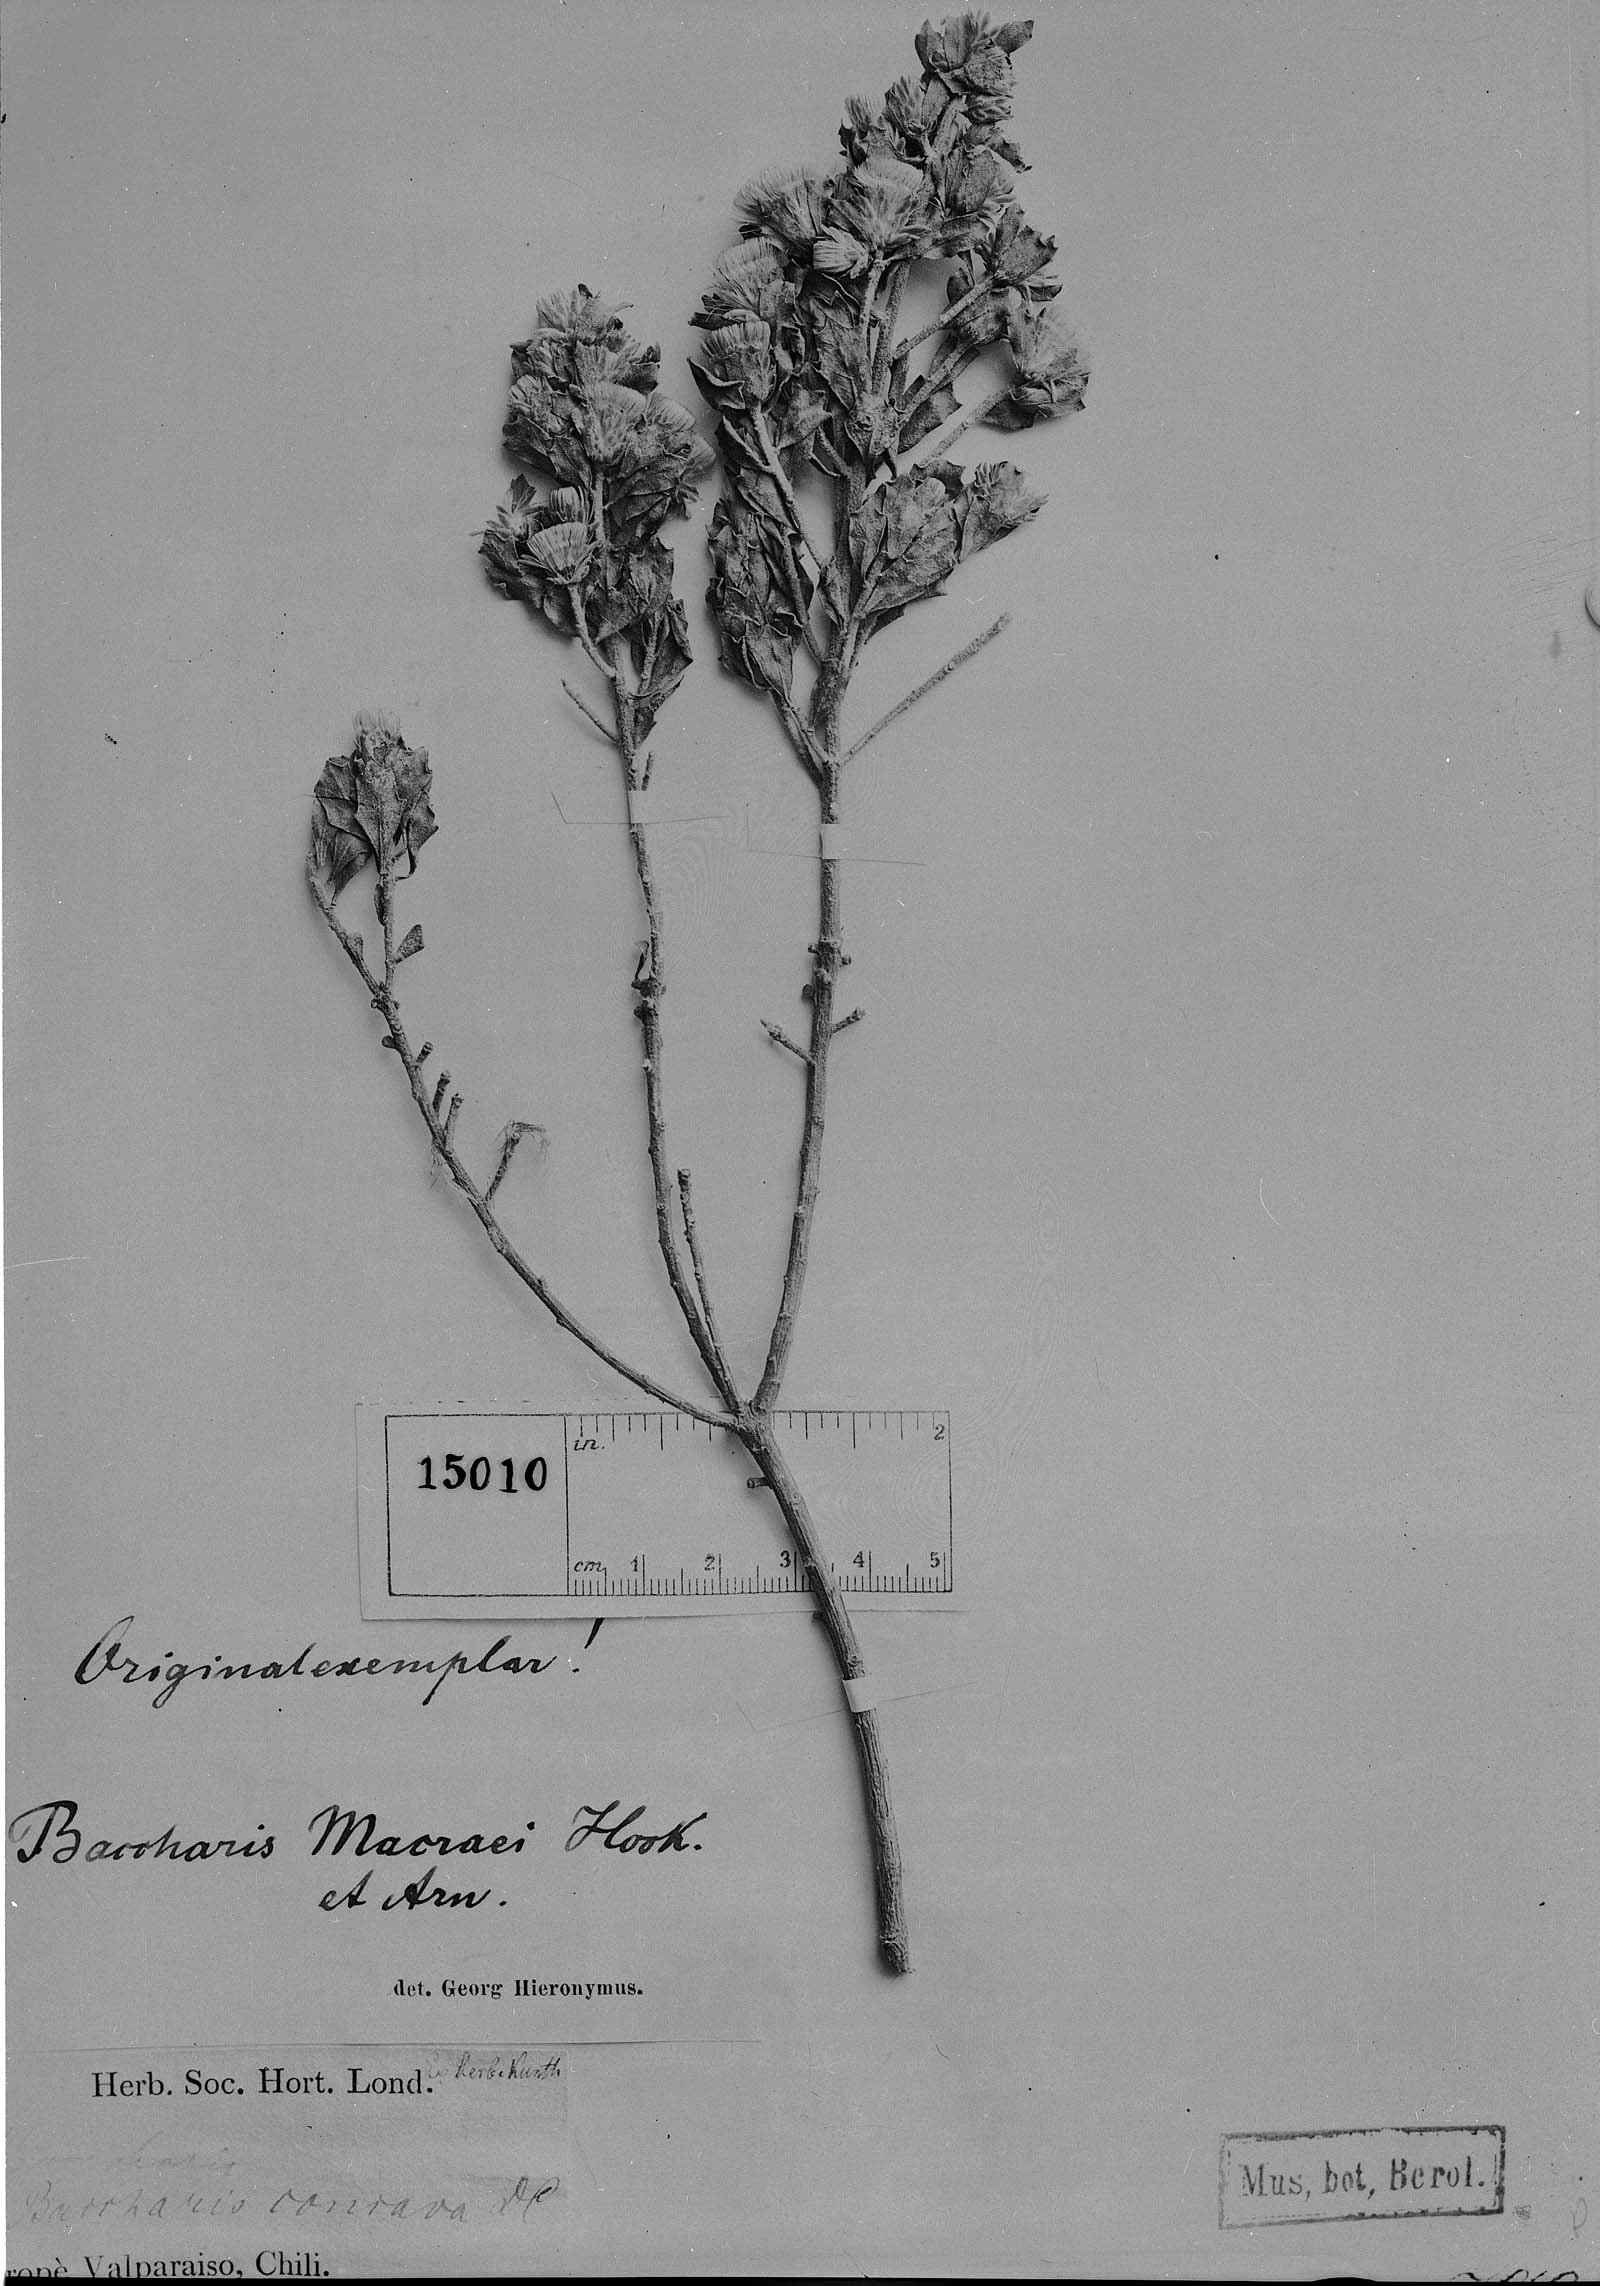 Baccharis macraei image